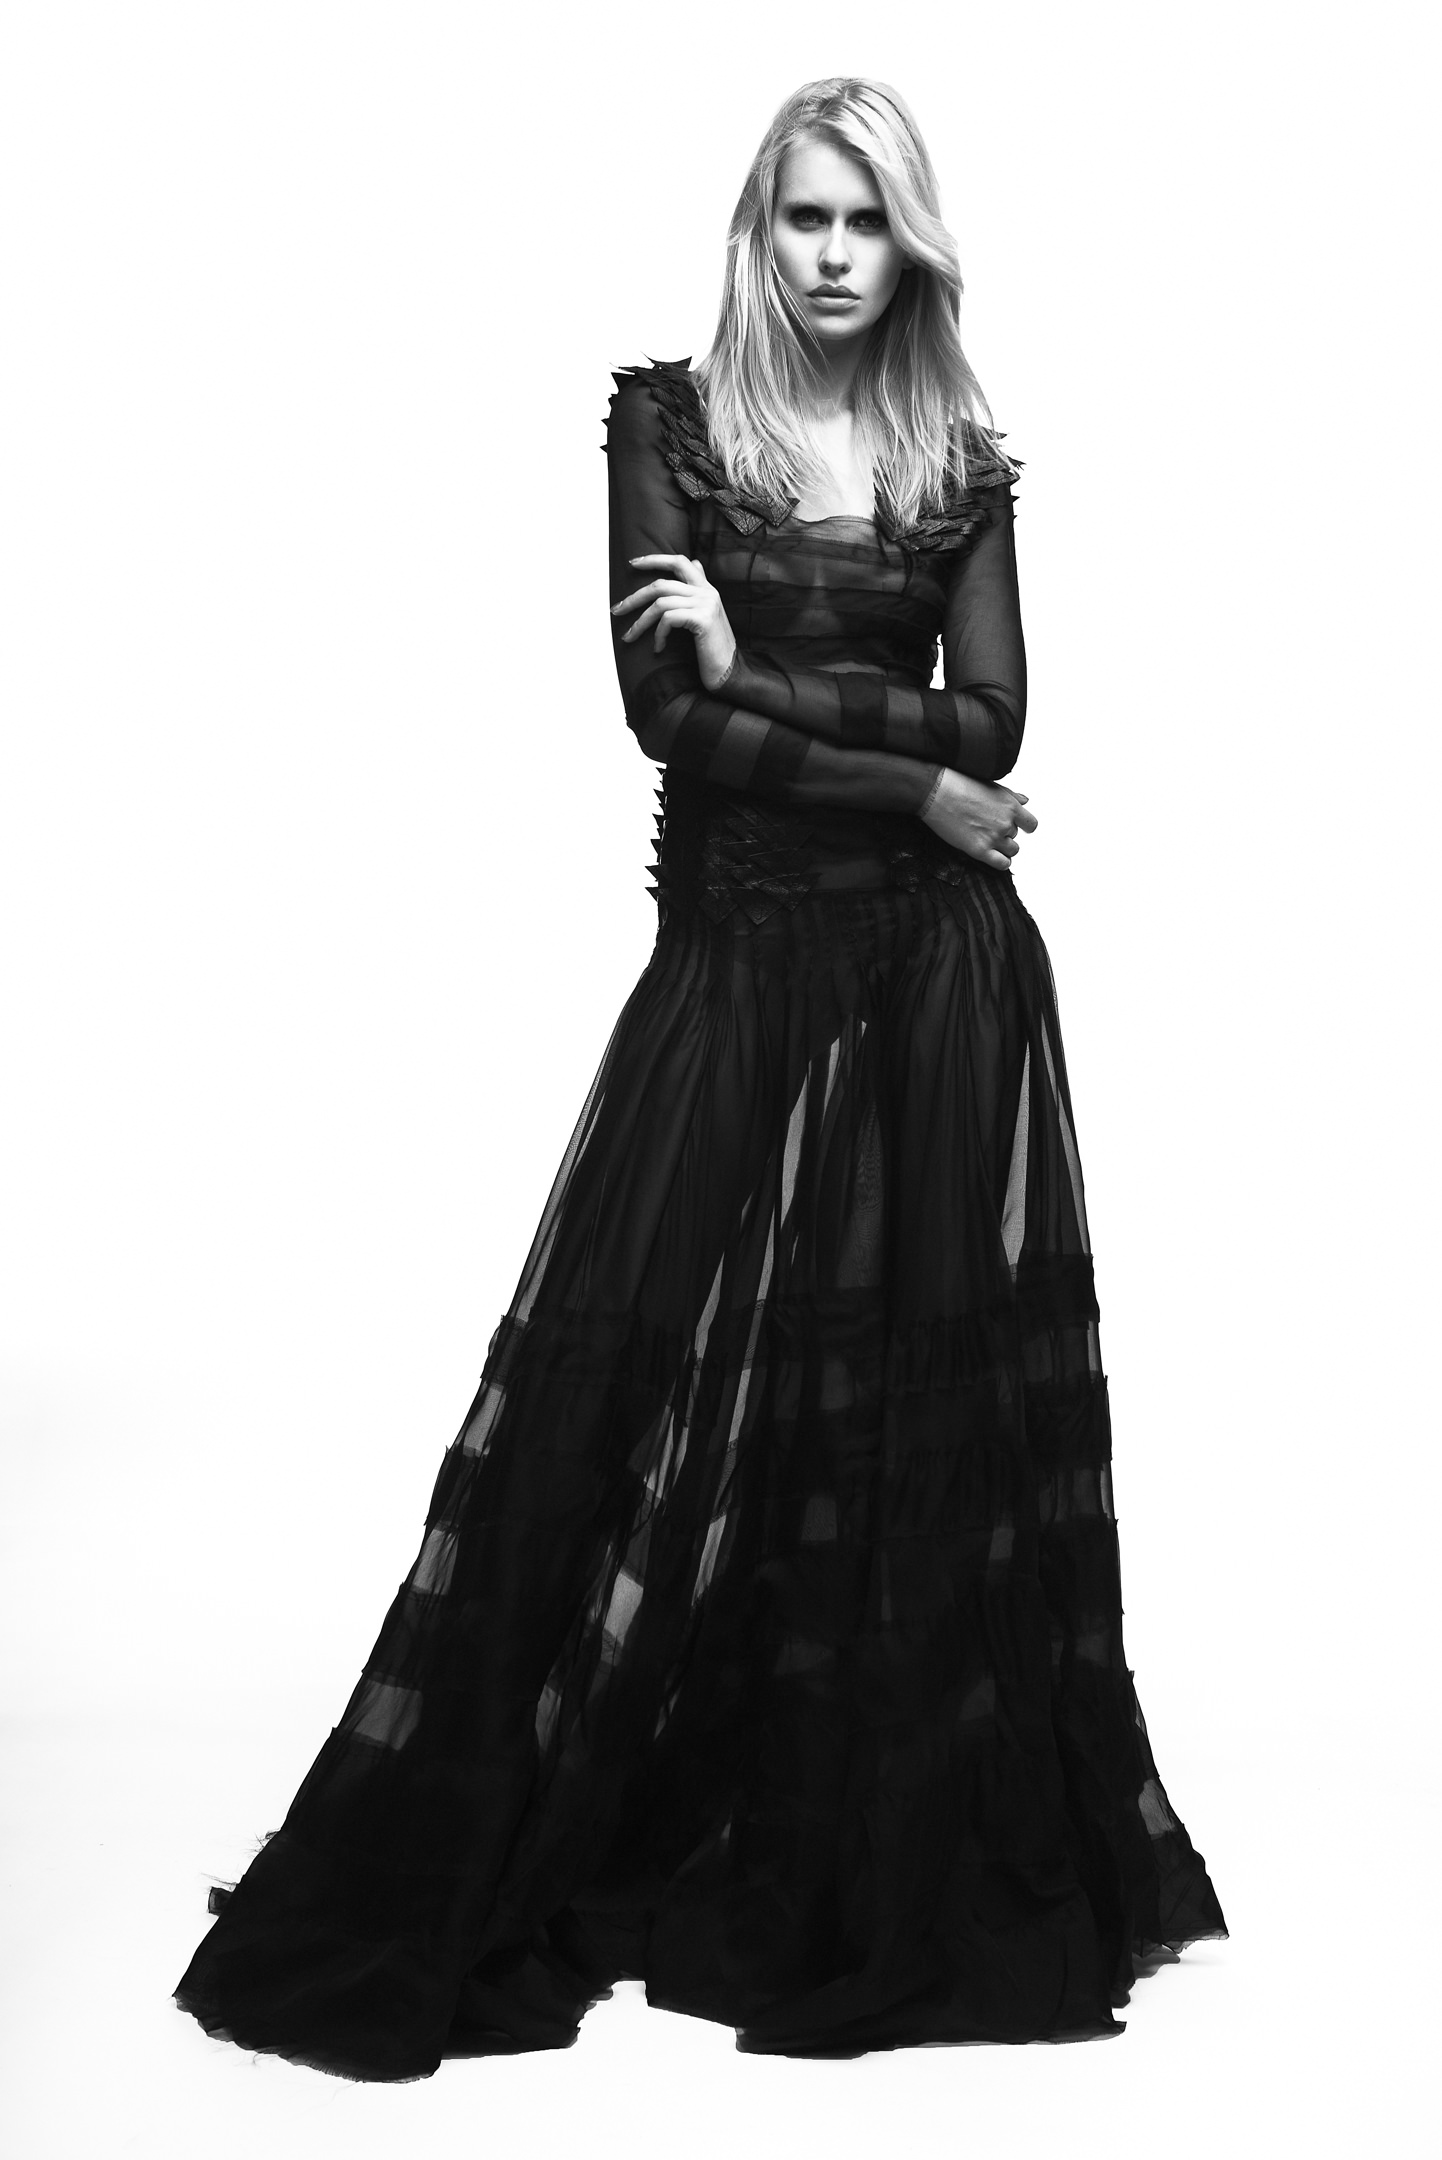 Maleficent-by-ANNA-BAZHANOVA-dh-12